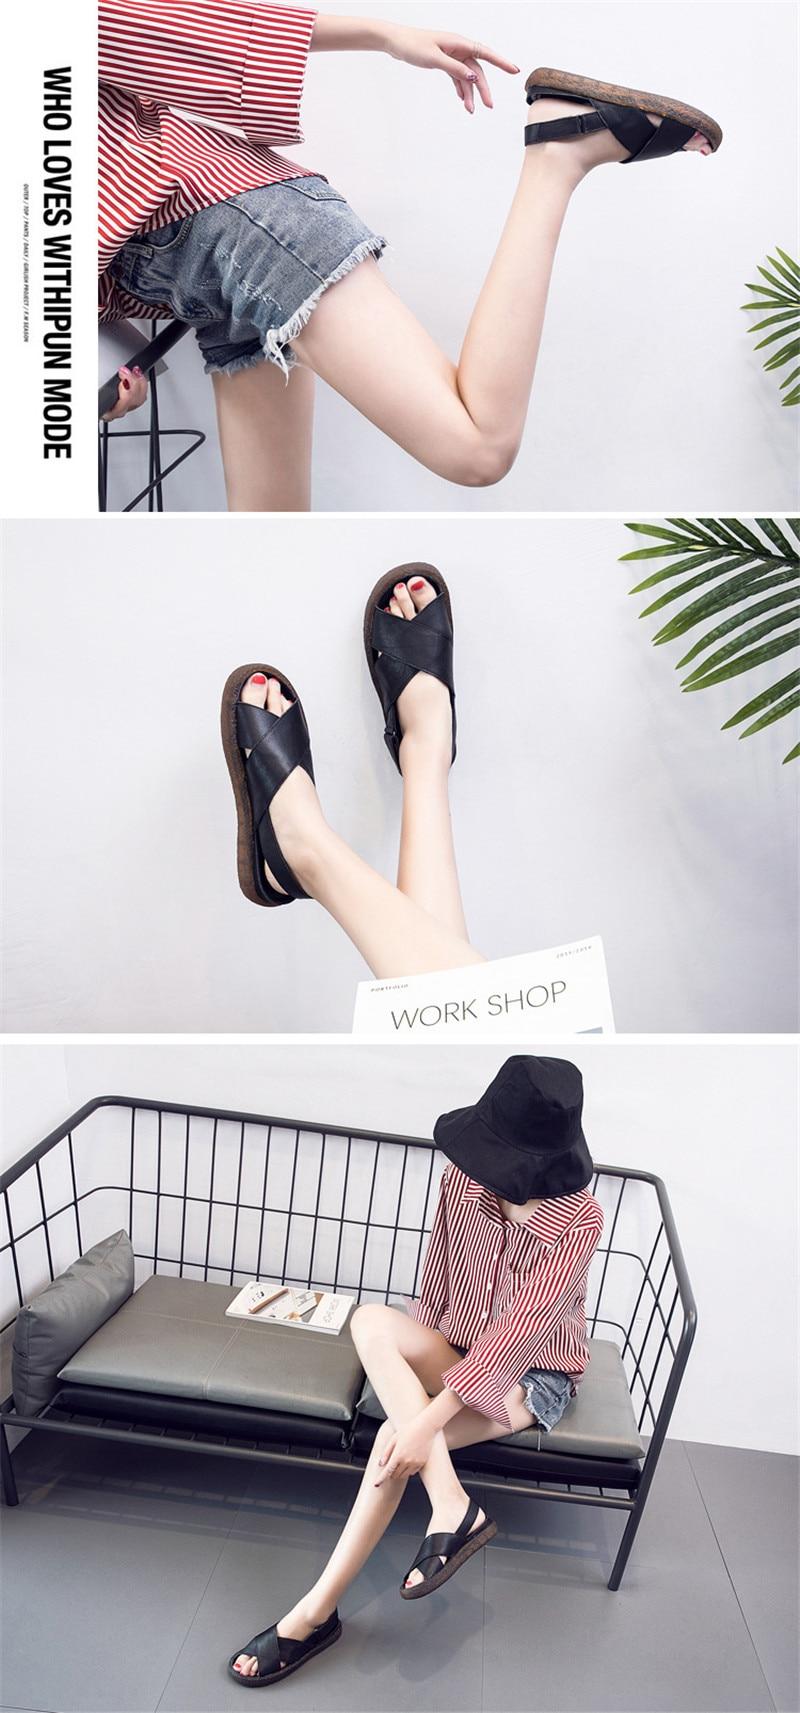 Genuine Leather Handmade Female Sandals Soft Bottom Casual Women Flats Platform Shoes Cross Strap Peep Toe Ladies Slippers Shoes (11)